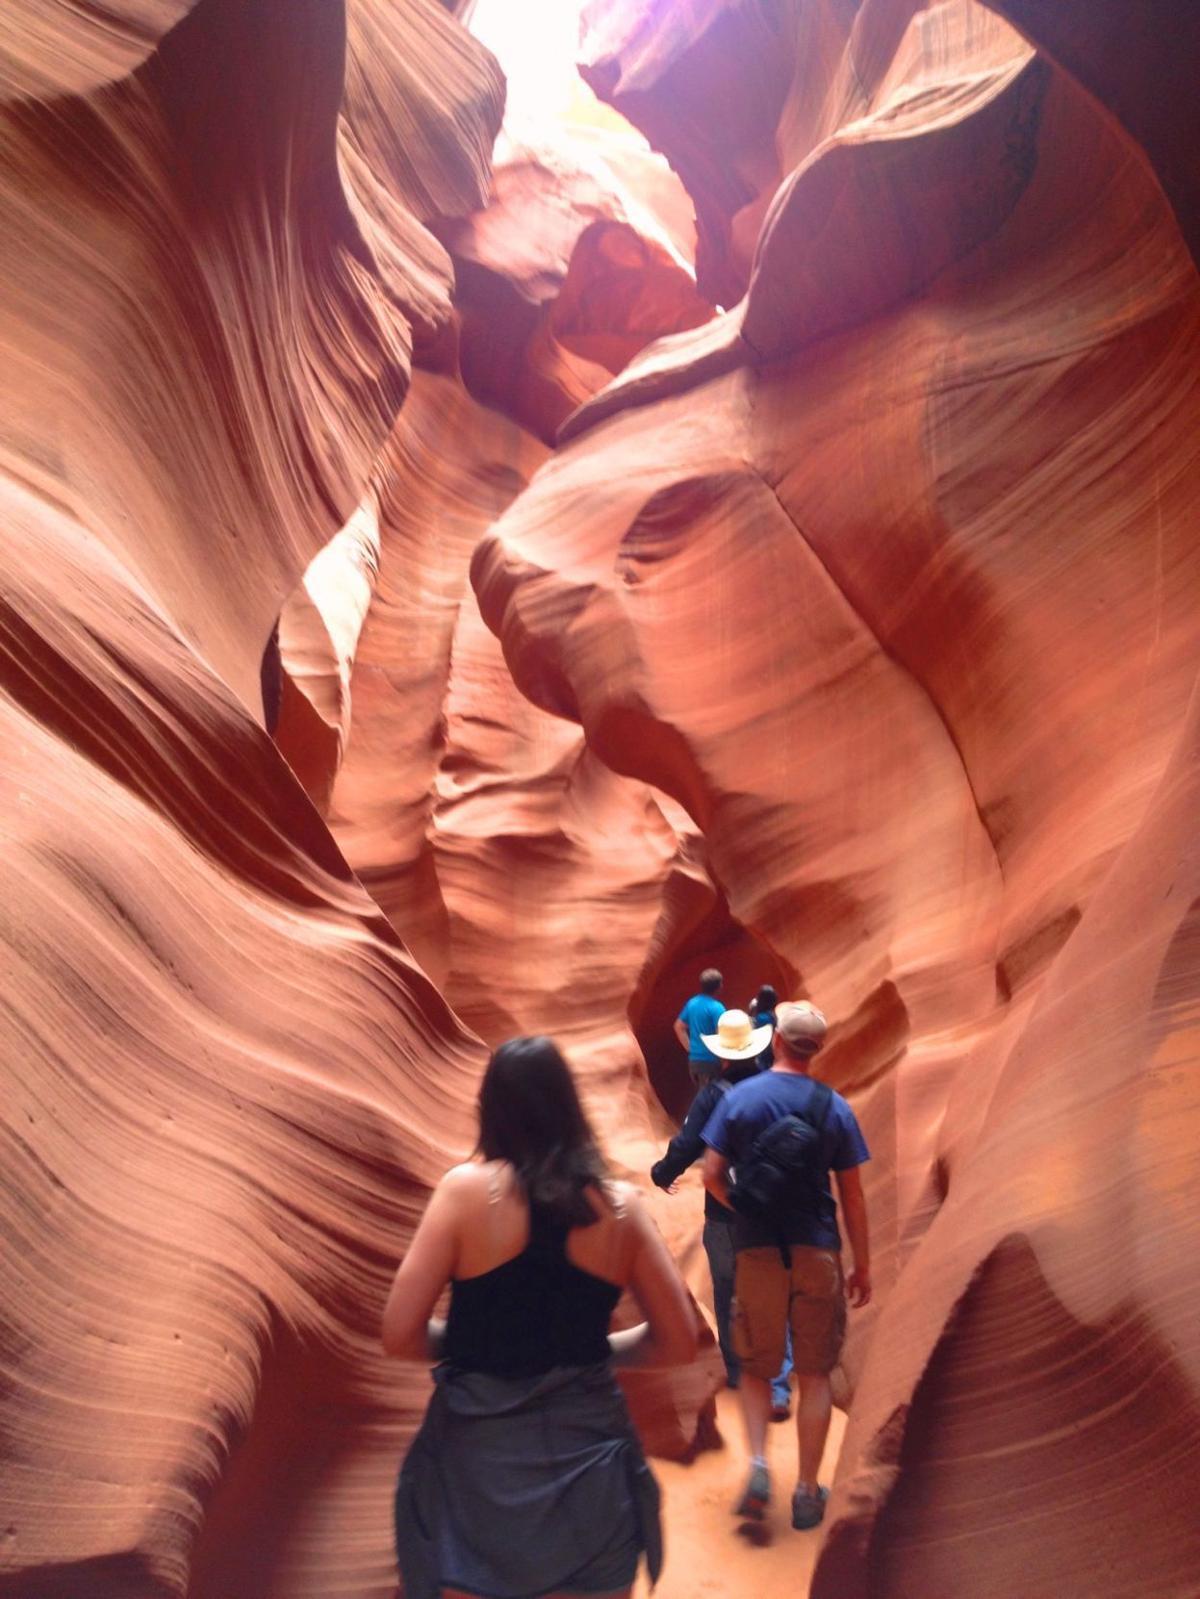 Tourists walk through a narrow passageway